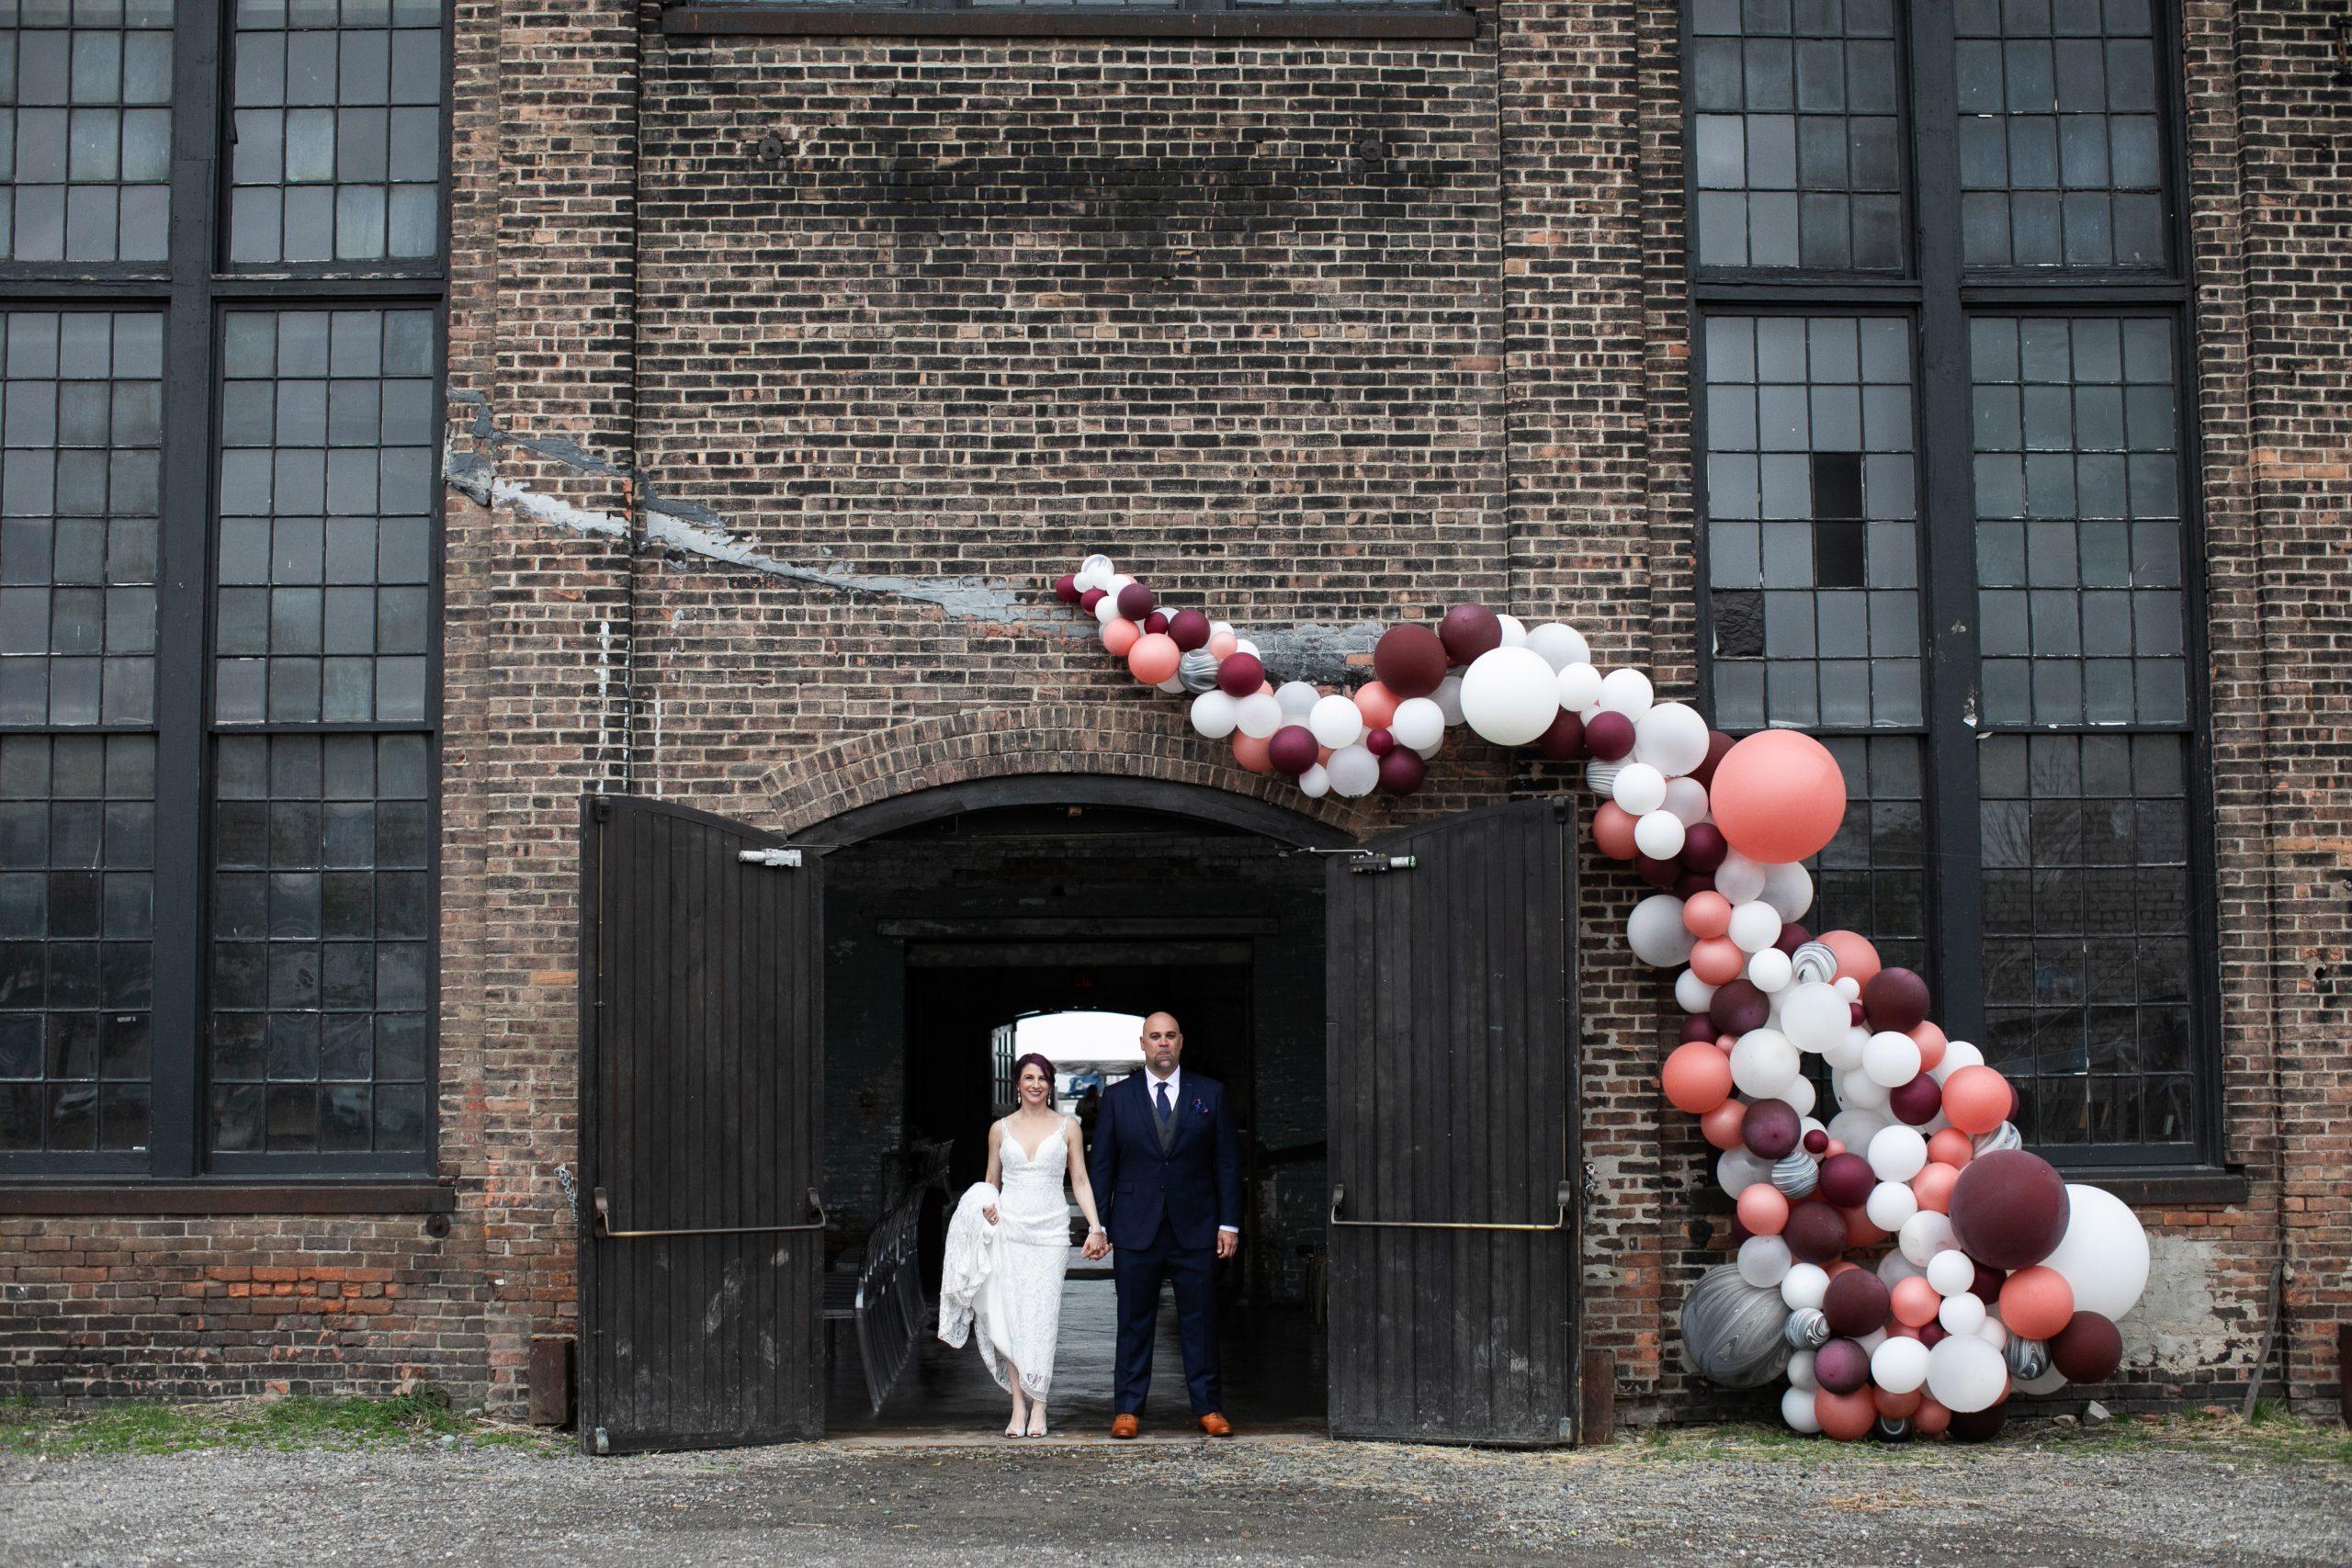 Couple posing in Basilica Hudson doorway with ballon arch